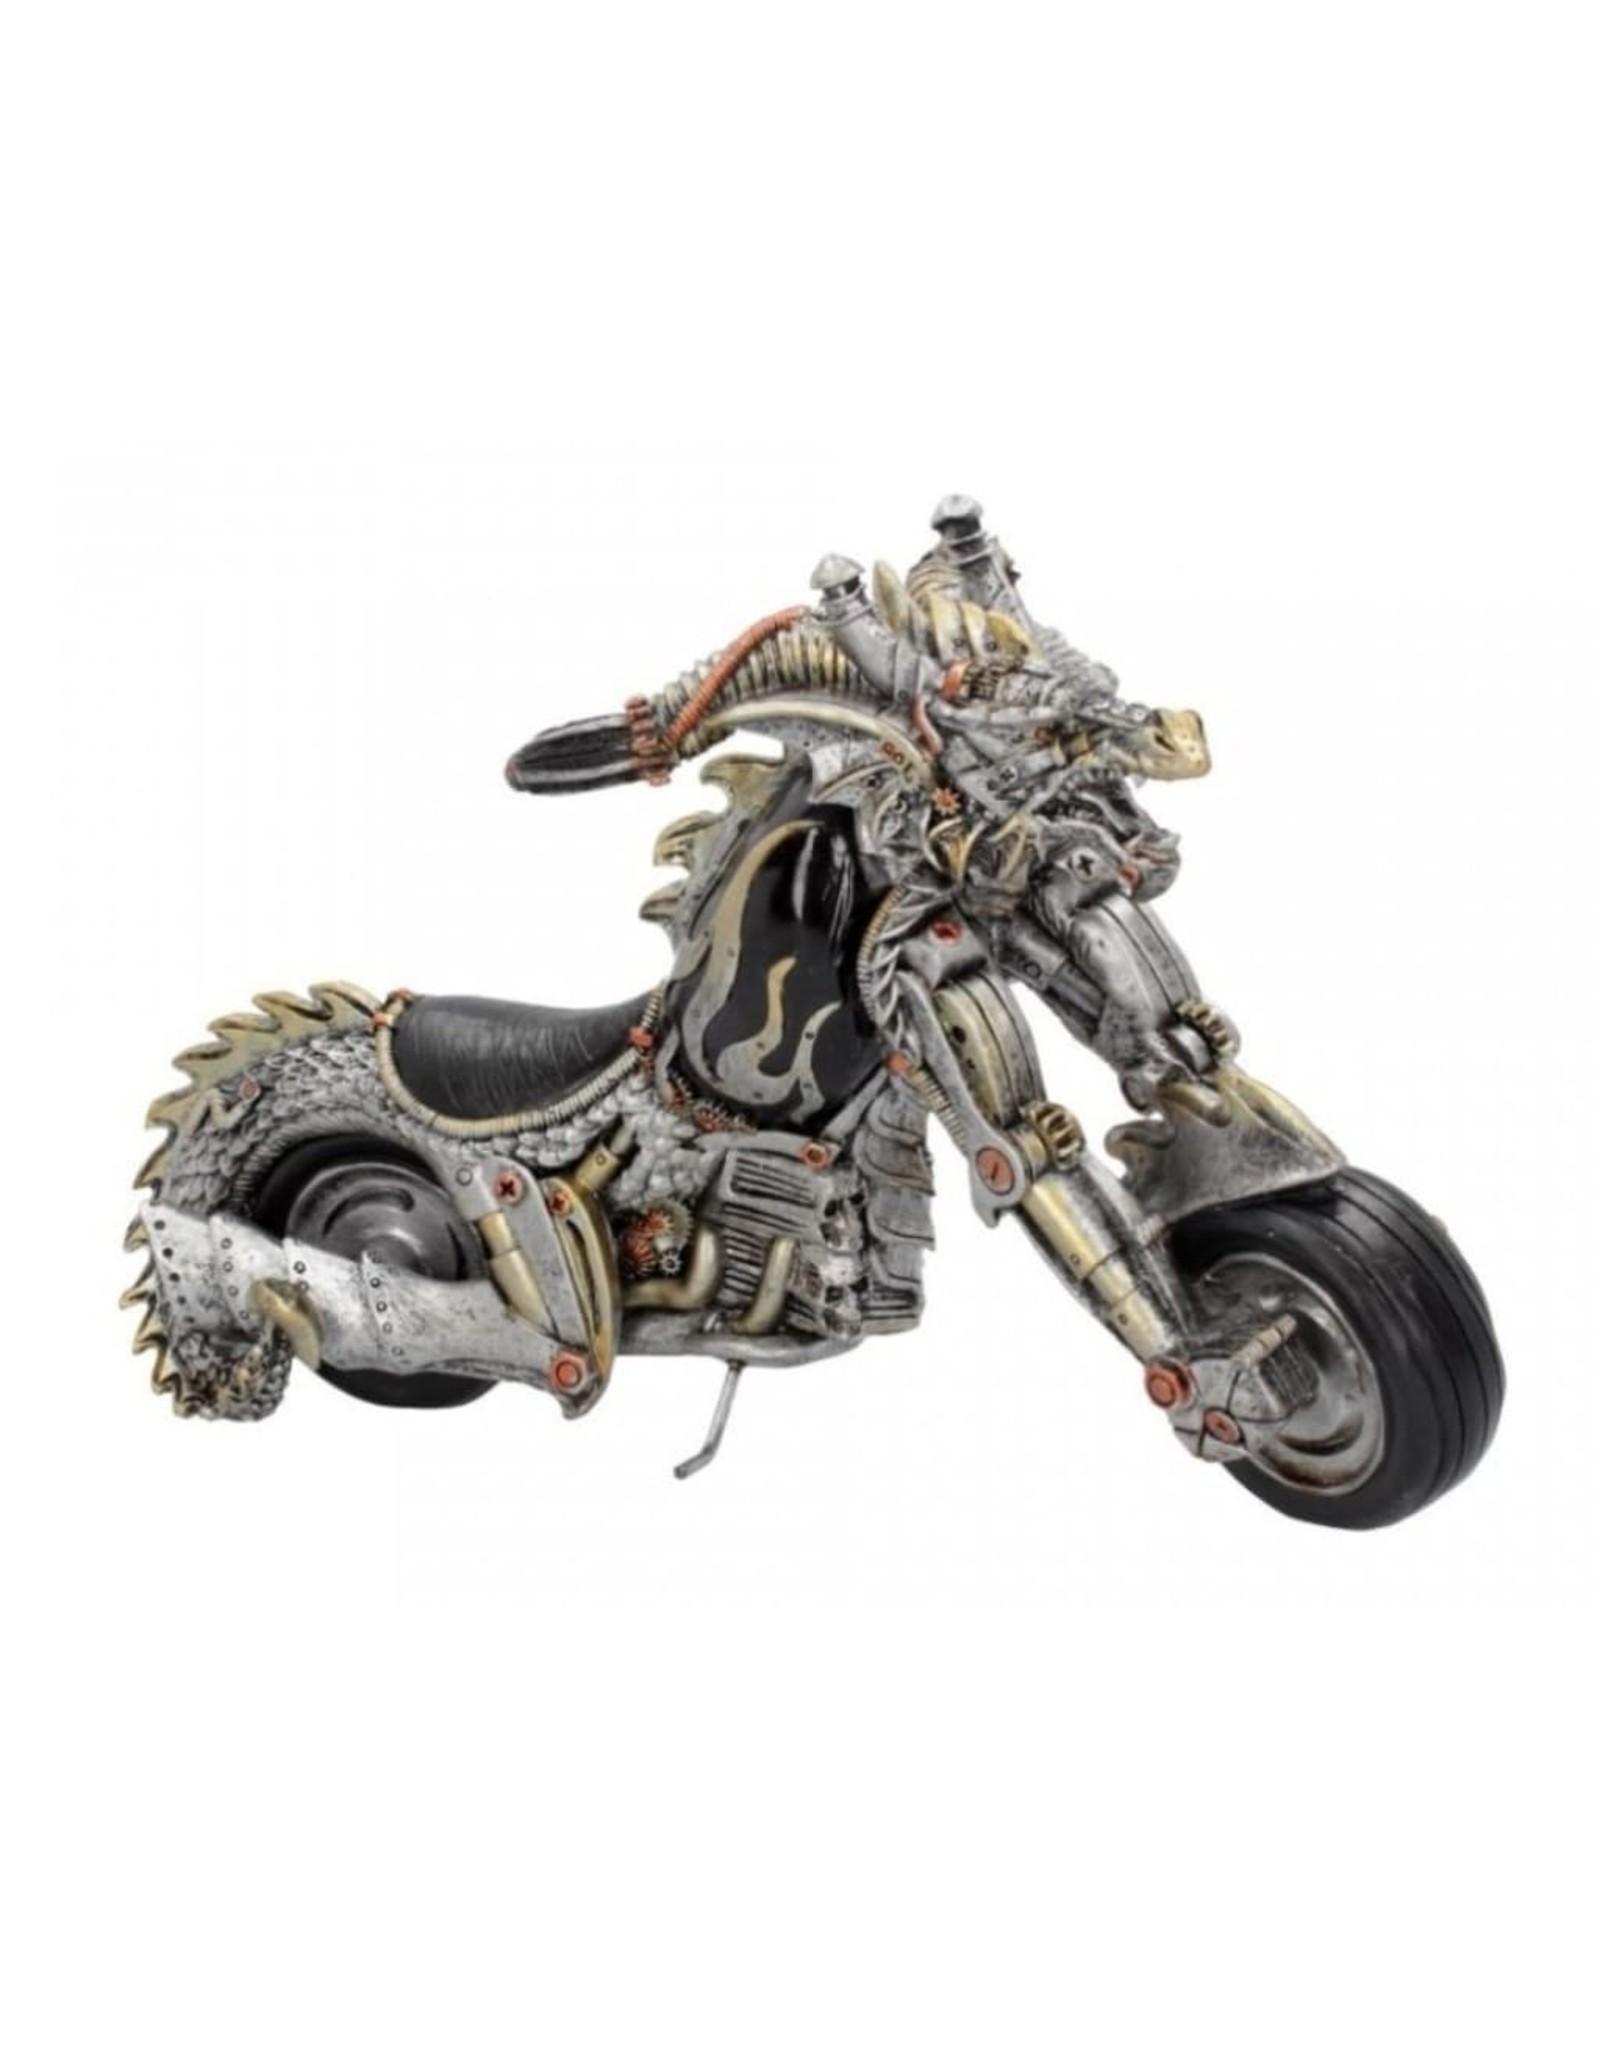 Alator Collectables - Dracus Birota Gothic Motor miniatuur - Nemesis Mow